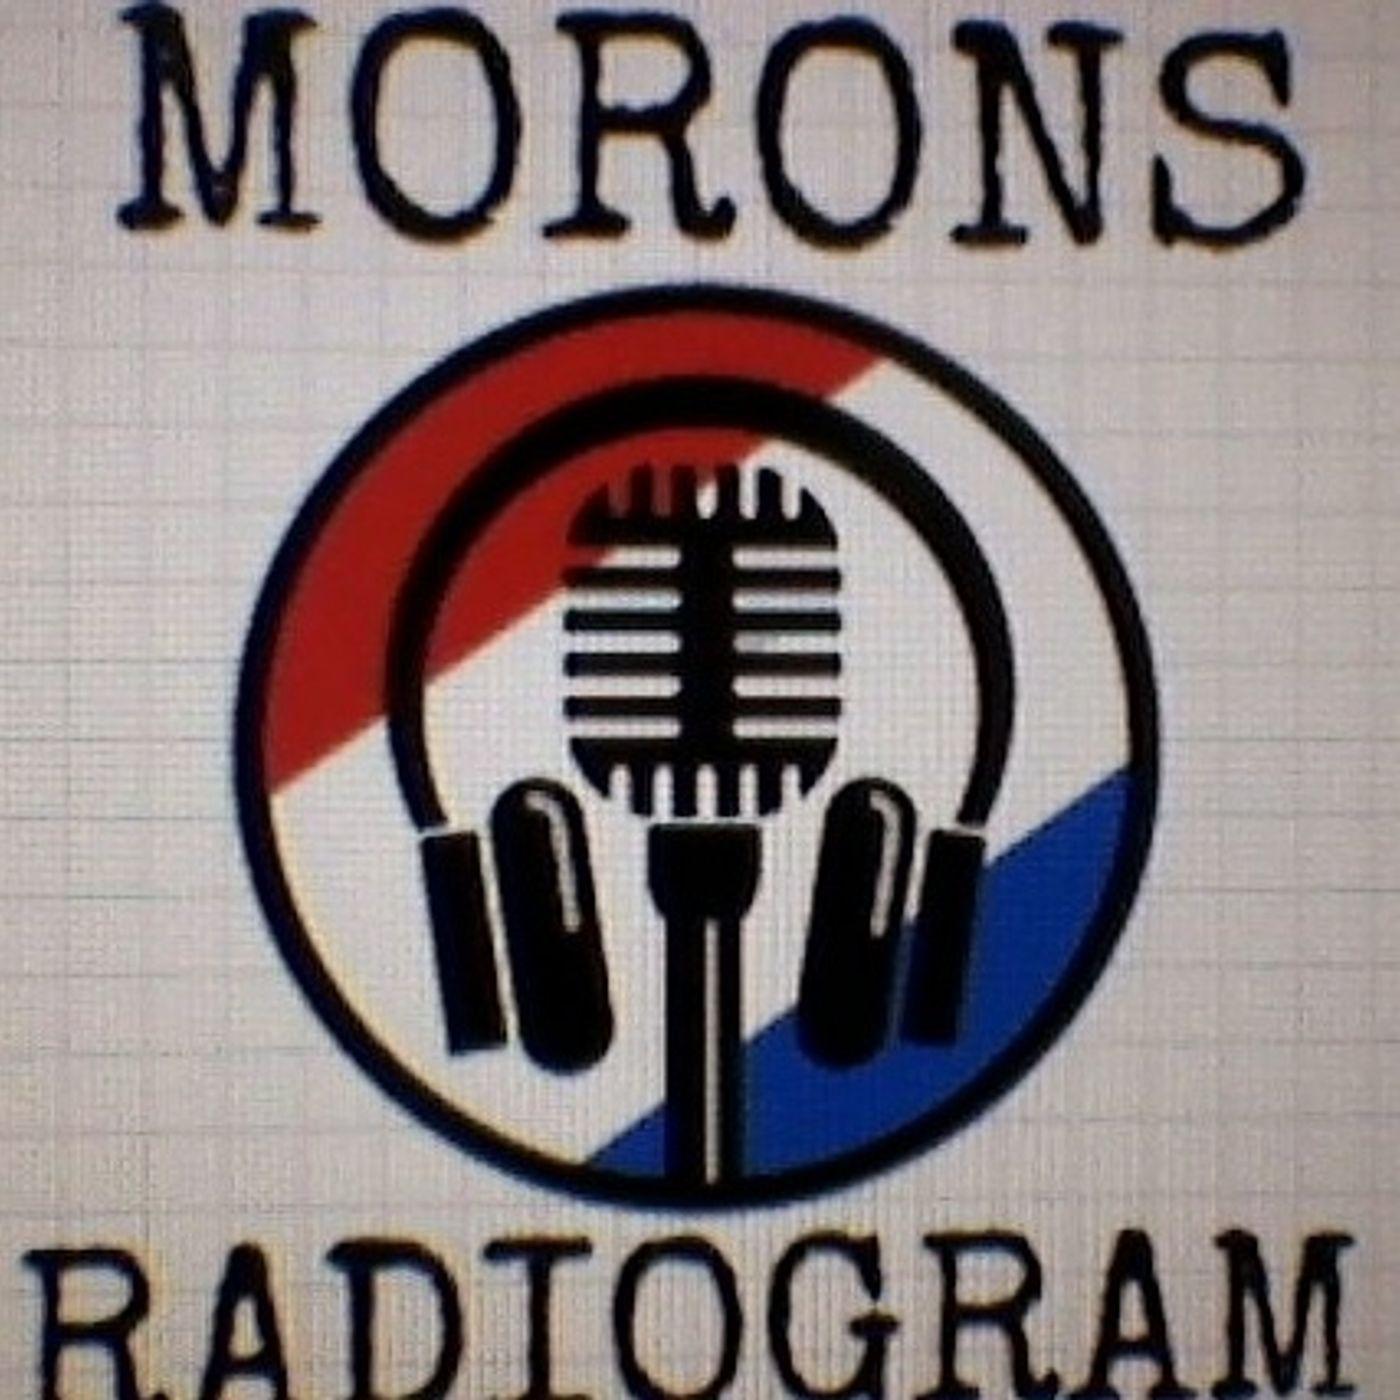 MORONS RADIOGRAM